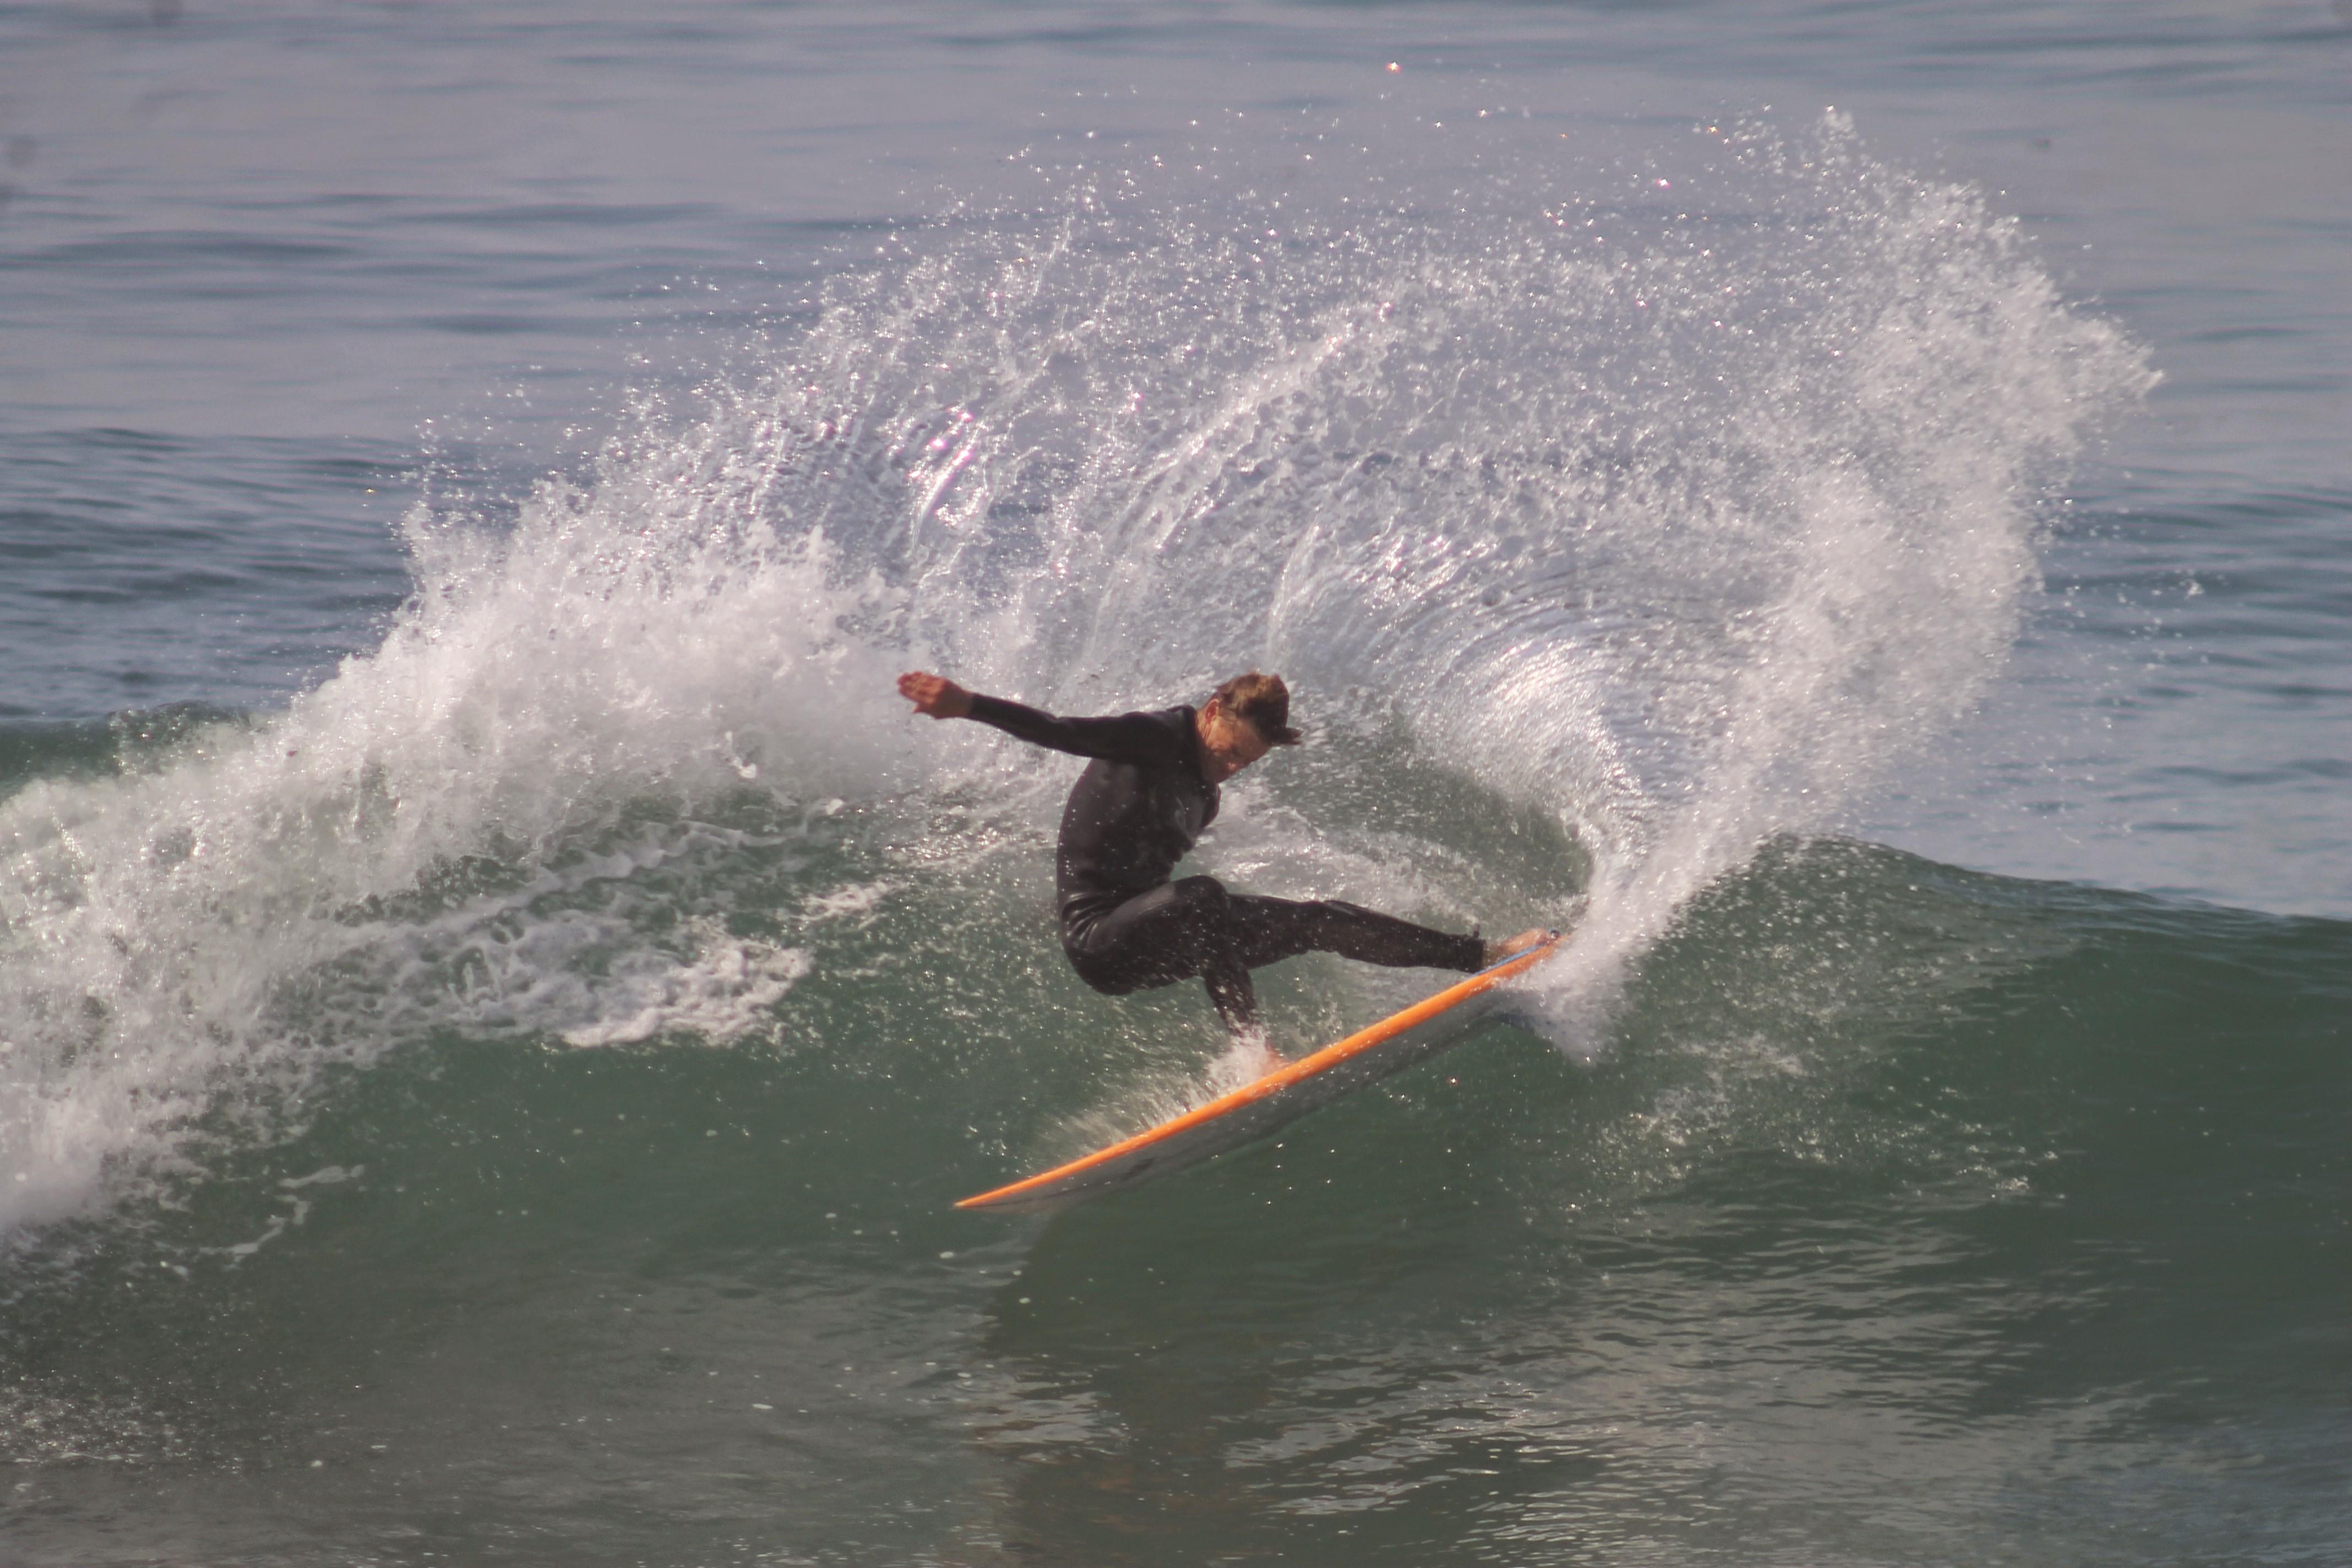 Ryan Polfer Polf Tail Surfboard